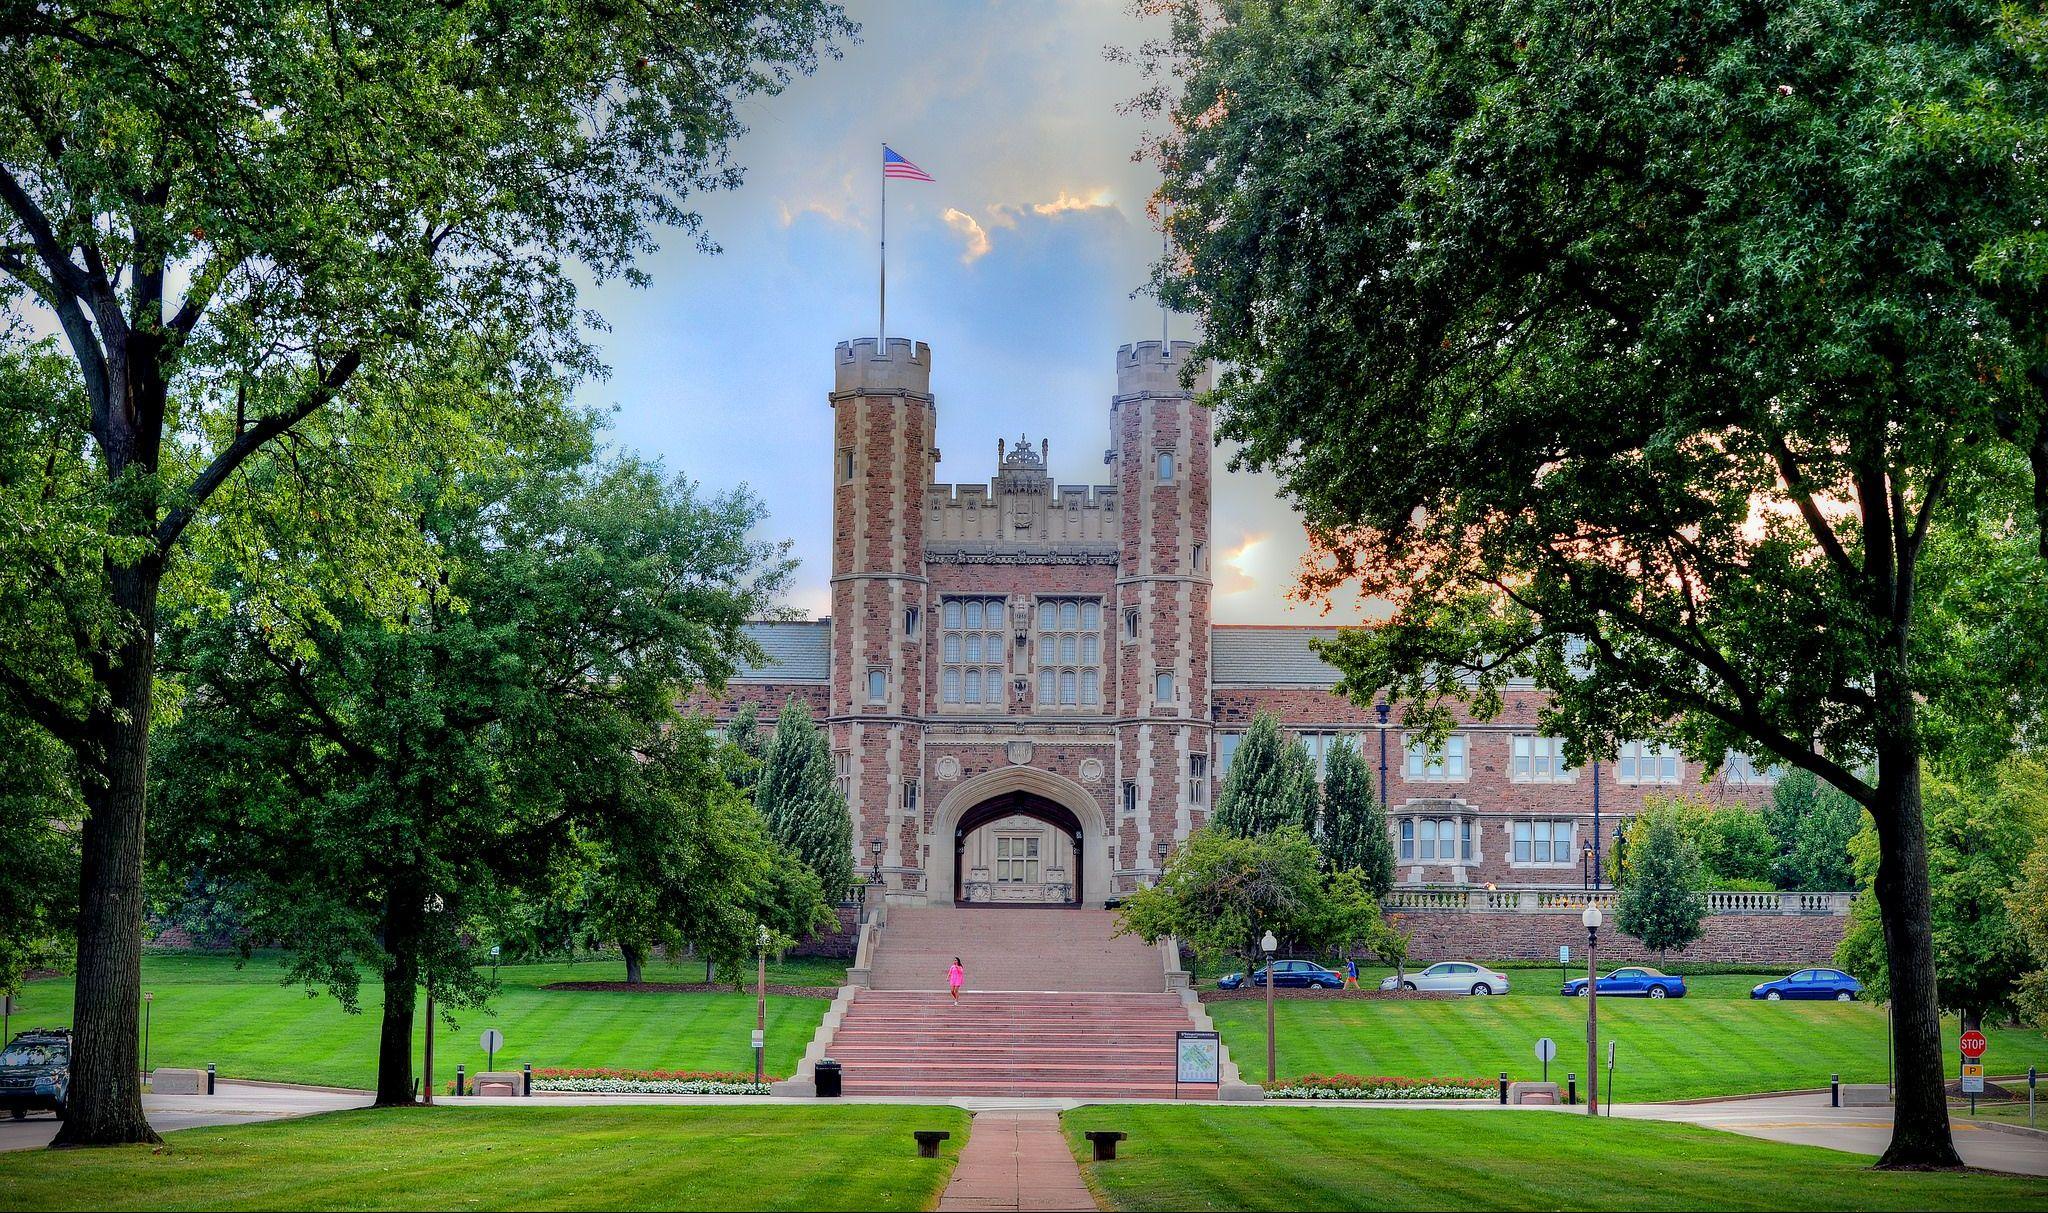 Washington_University_in_St_Louis_5686901_i0.jpg